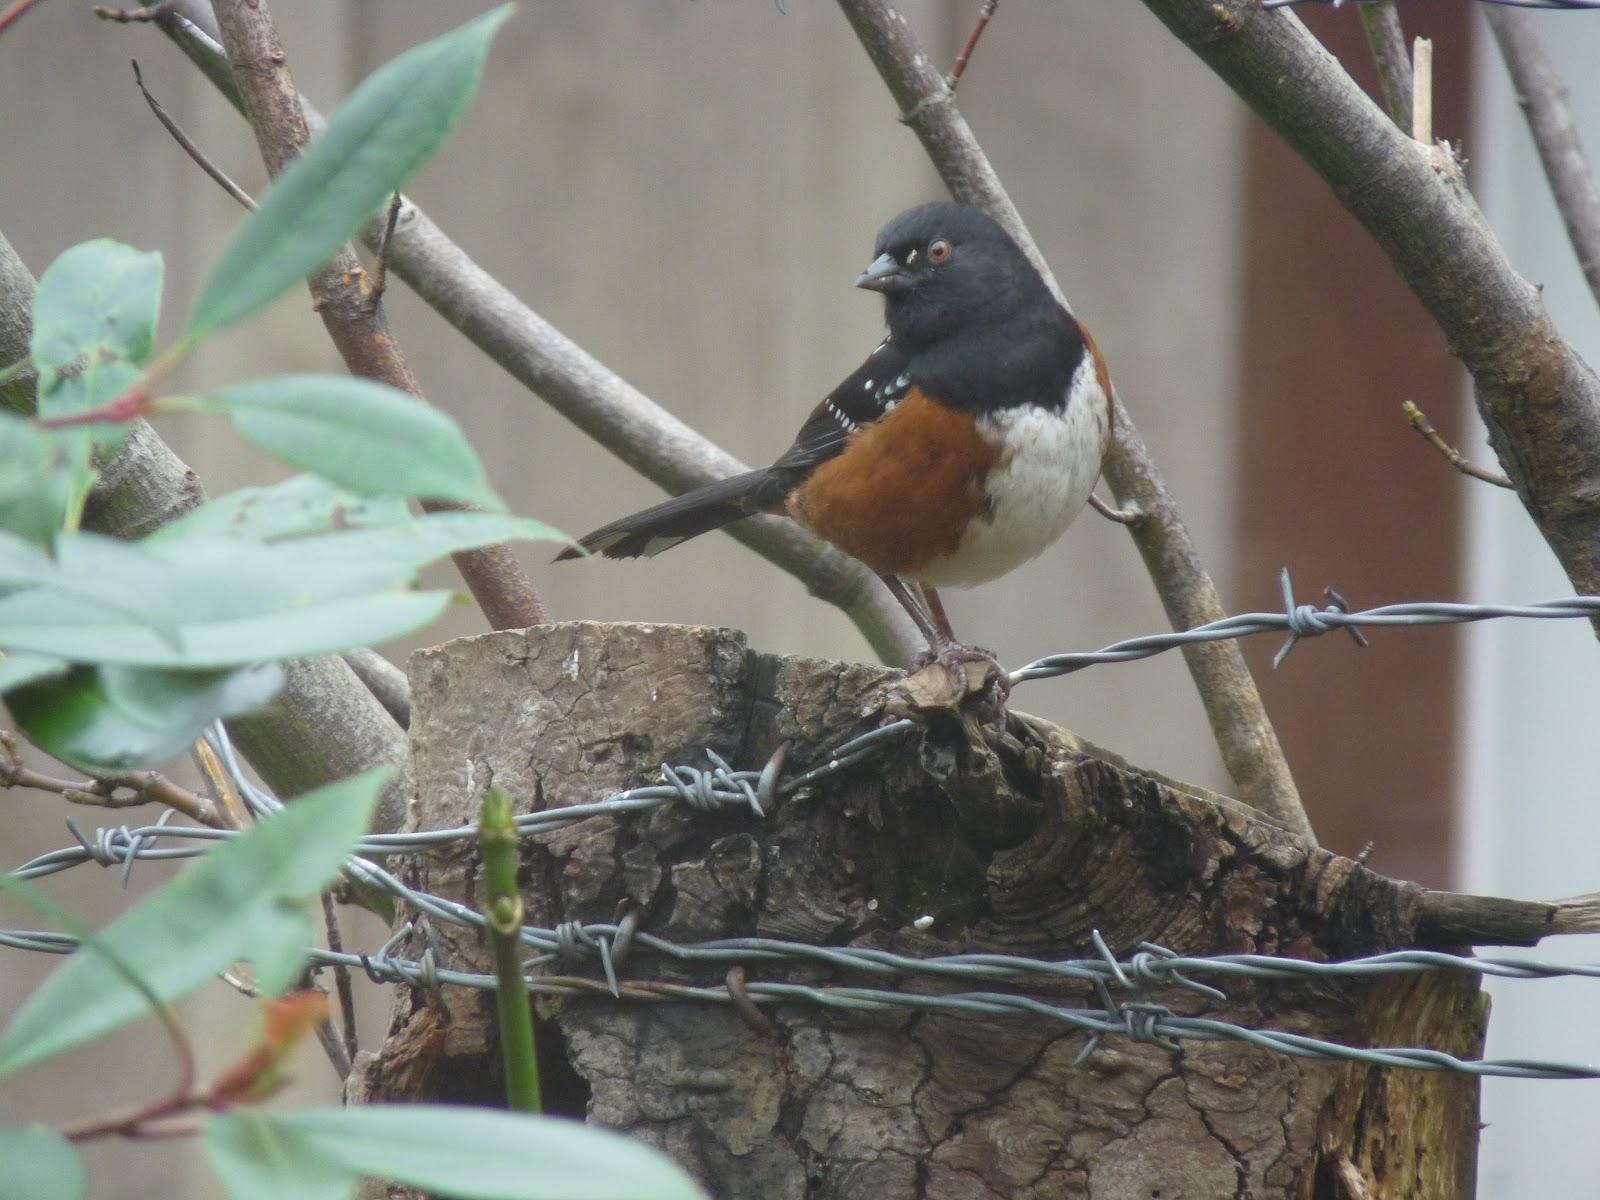 gabriola bird blog great backyard bird count